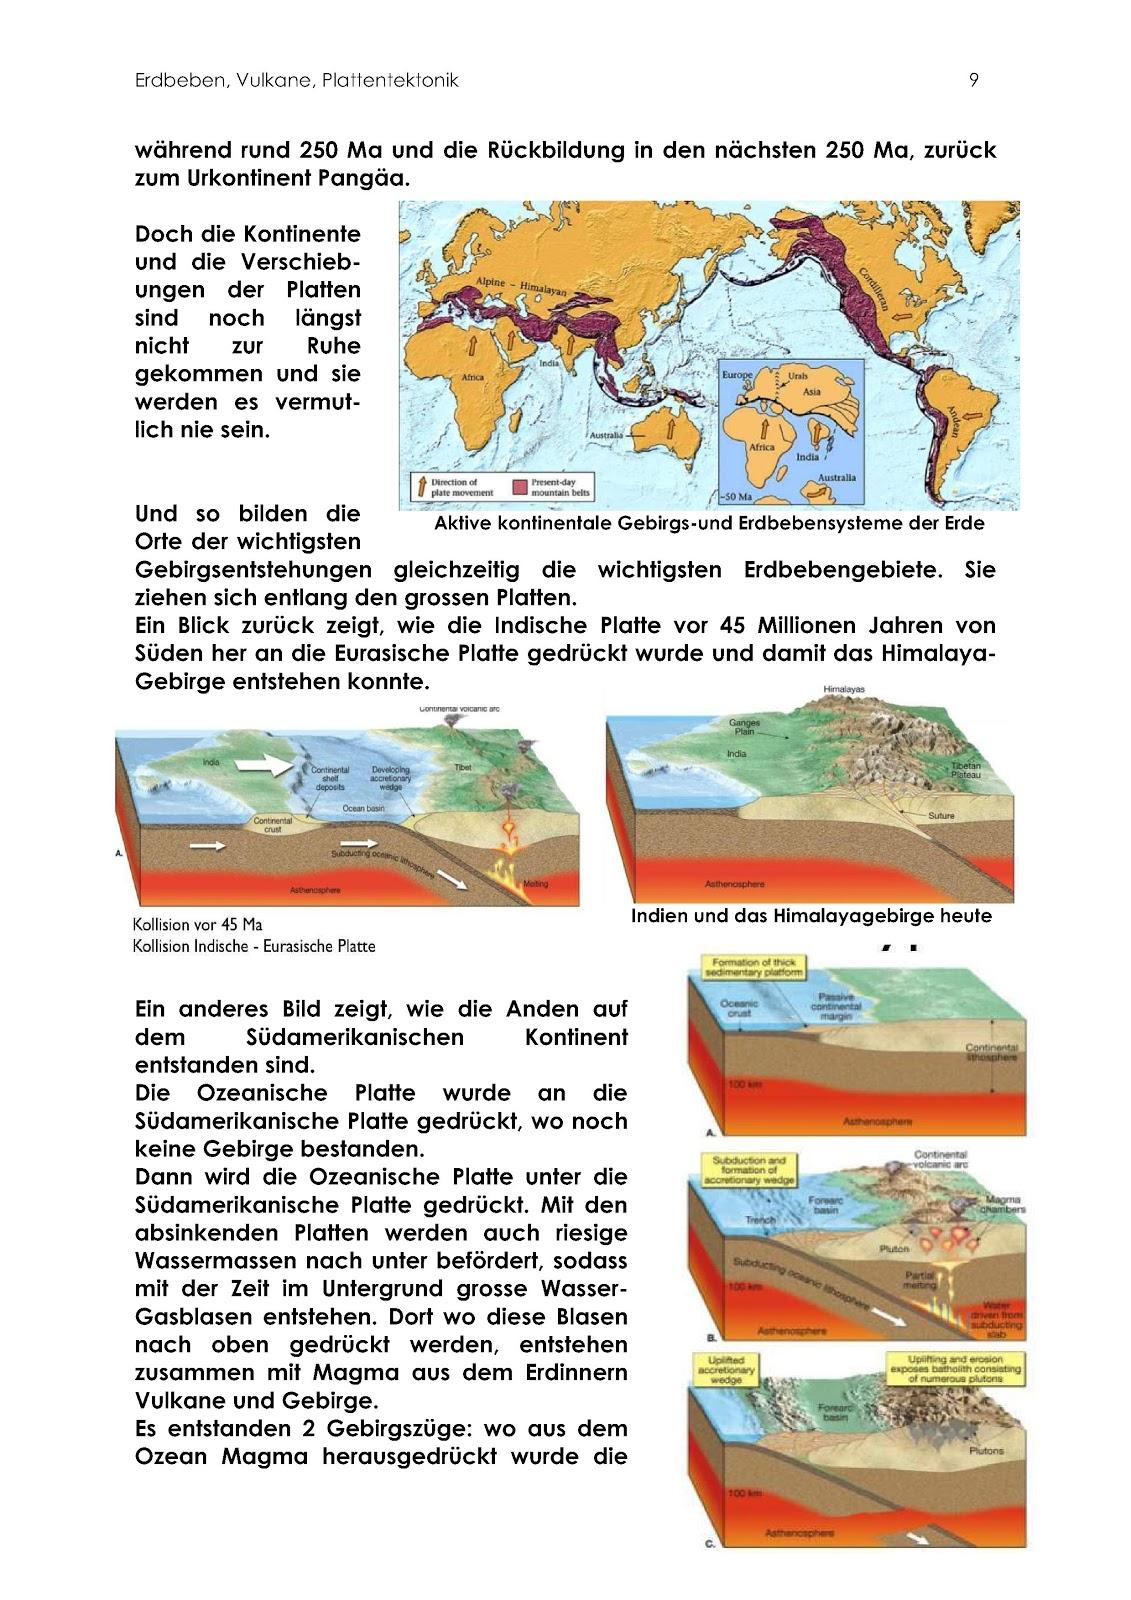 Tolle Erdbeben Diagramm Arbeitsblatt Bilder - Super Lehrer ...